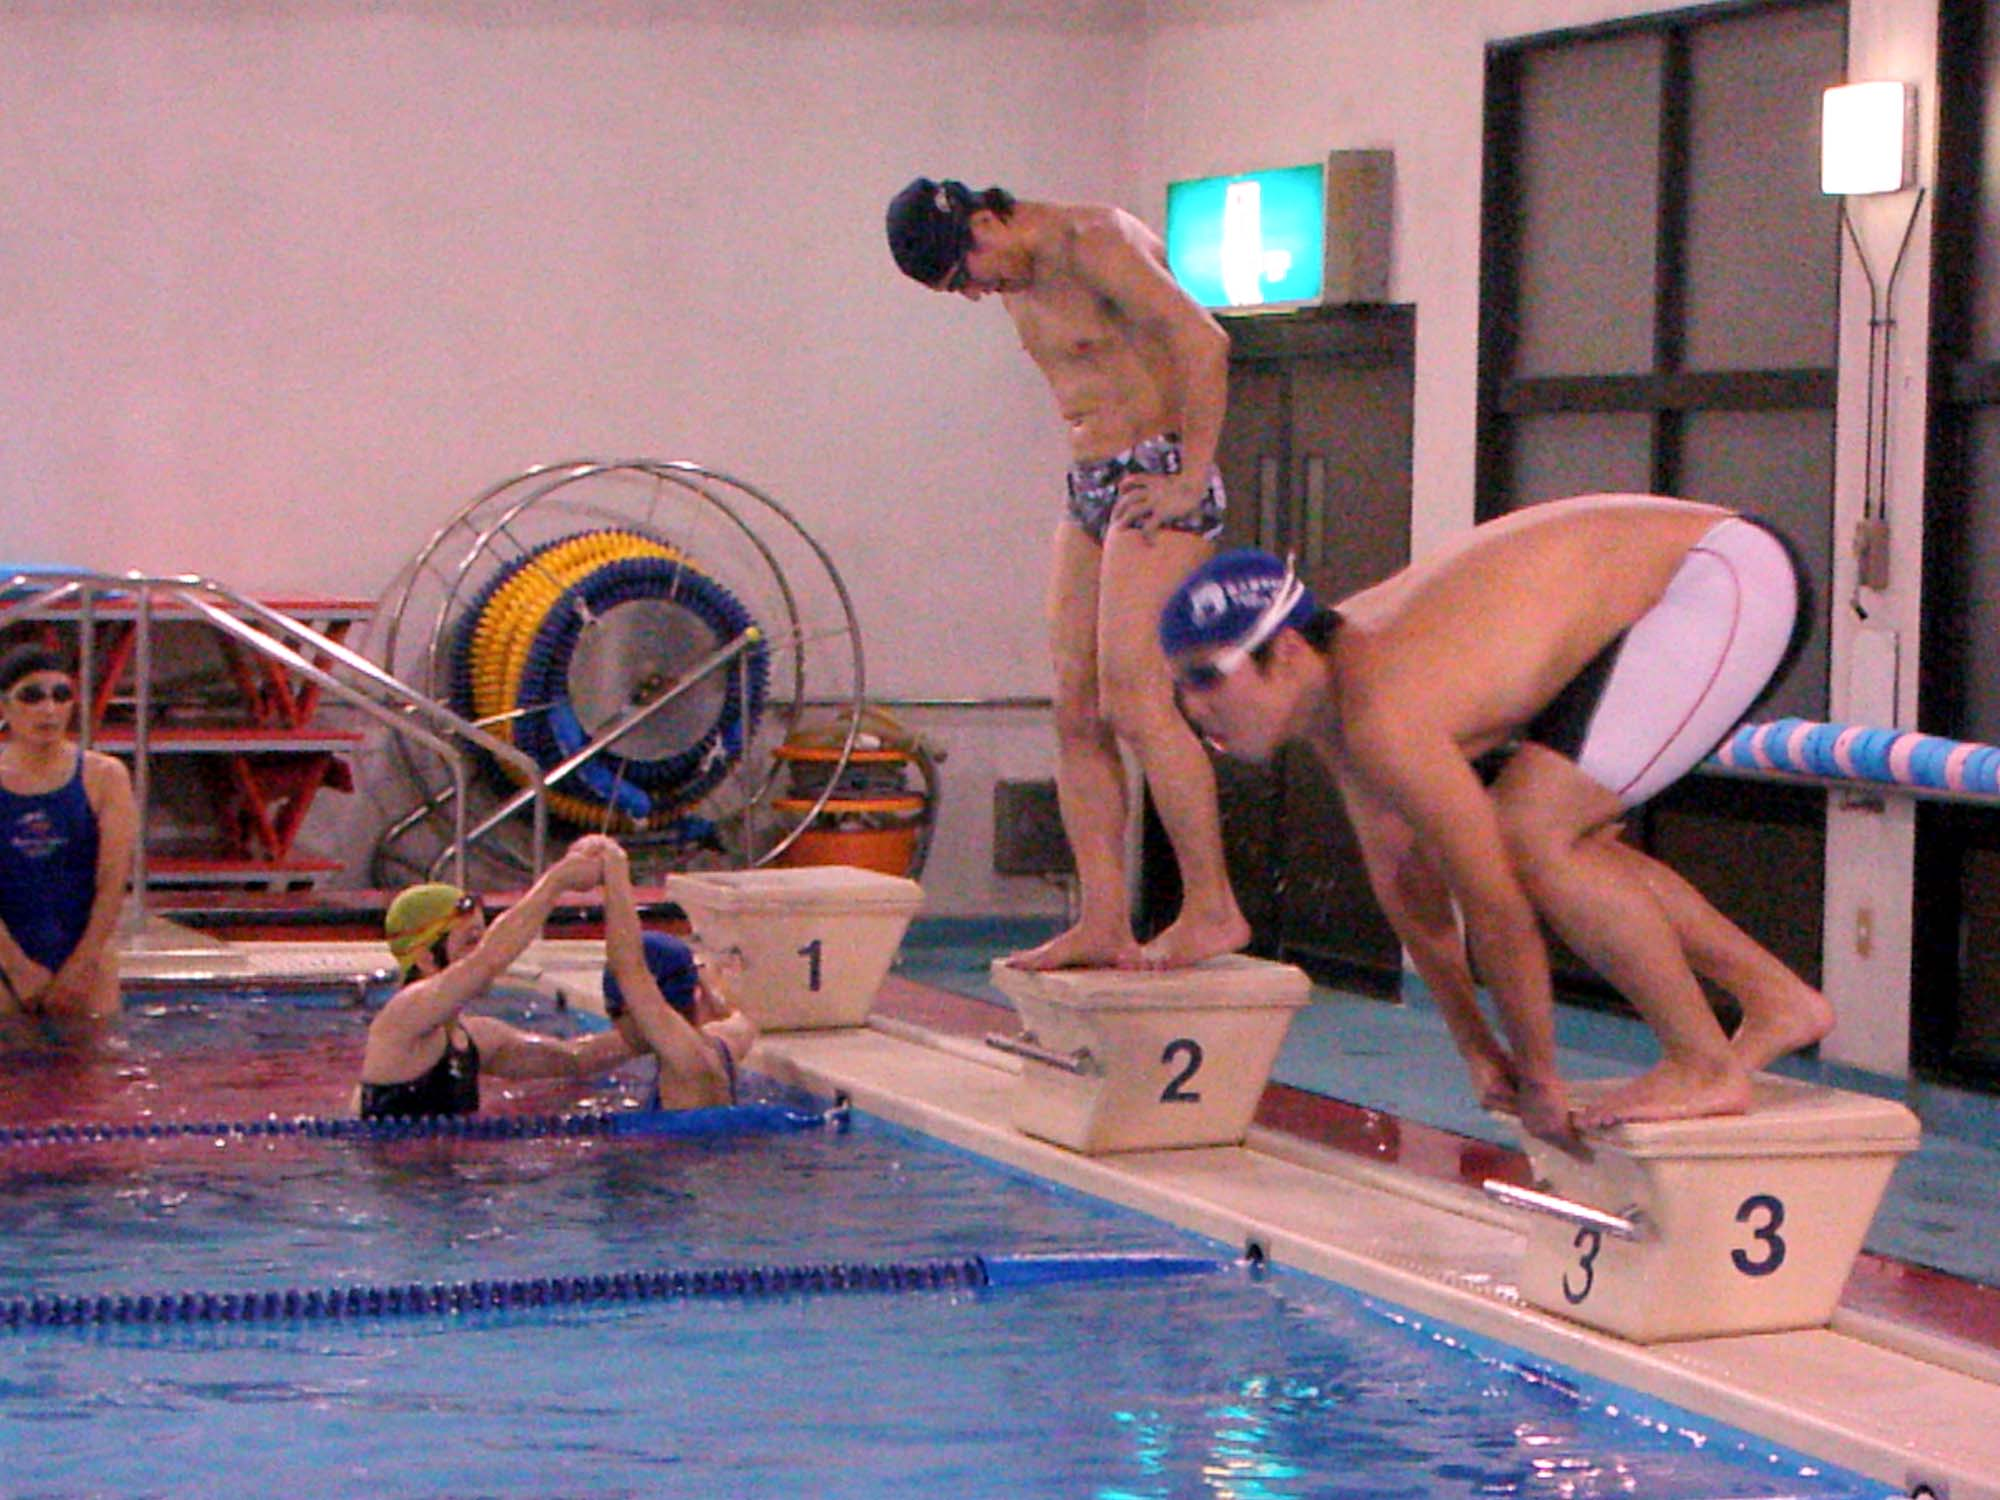 P8080041 - 都障水連による水泳教室より ・・・共催でおこなっています。